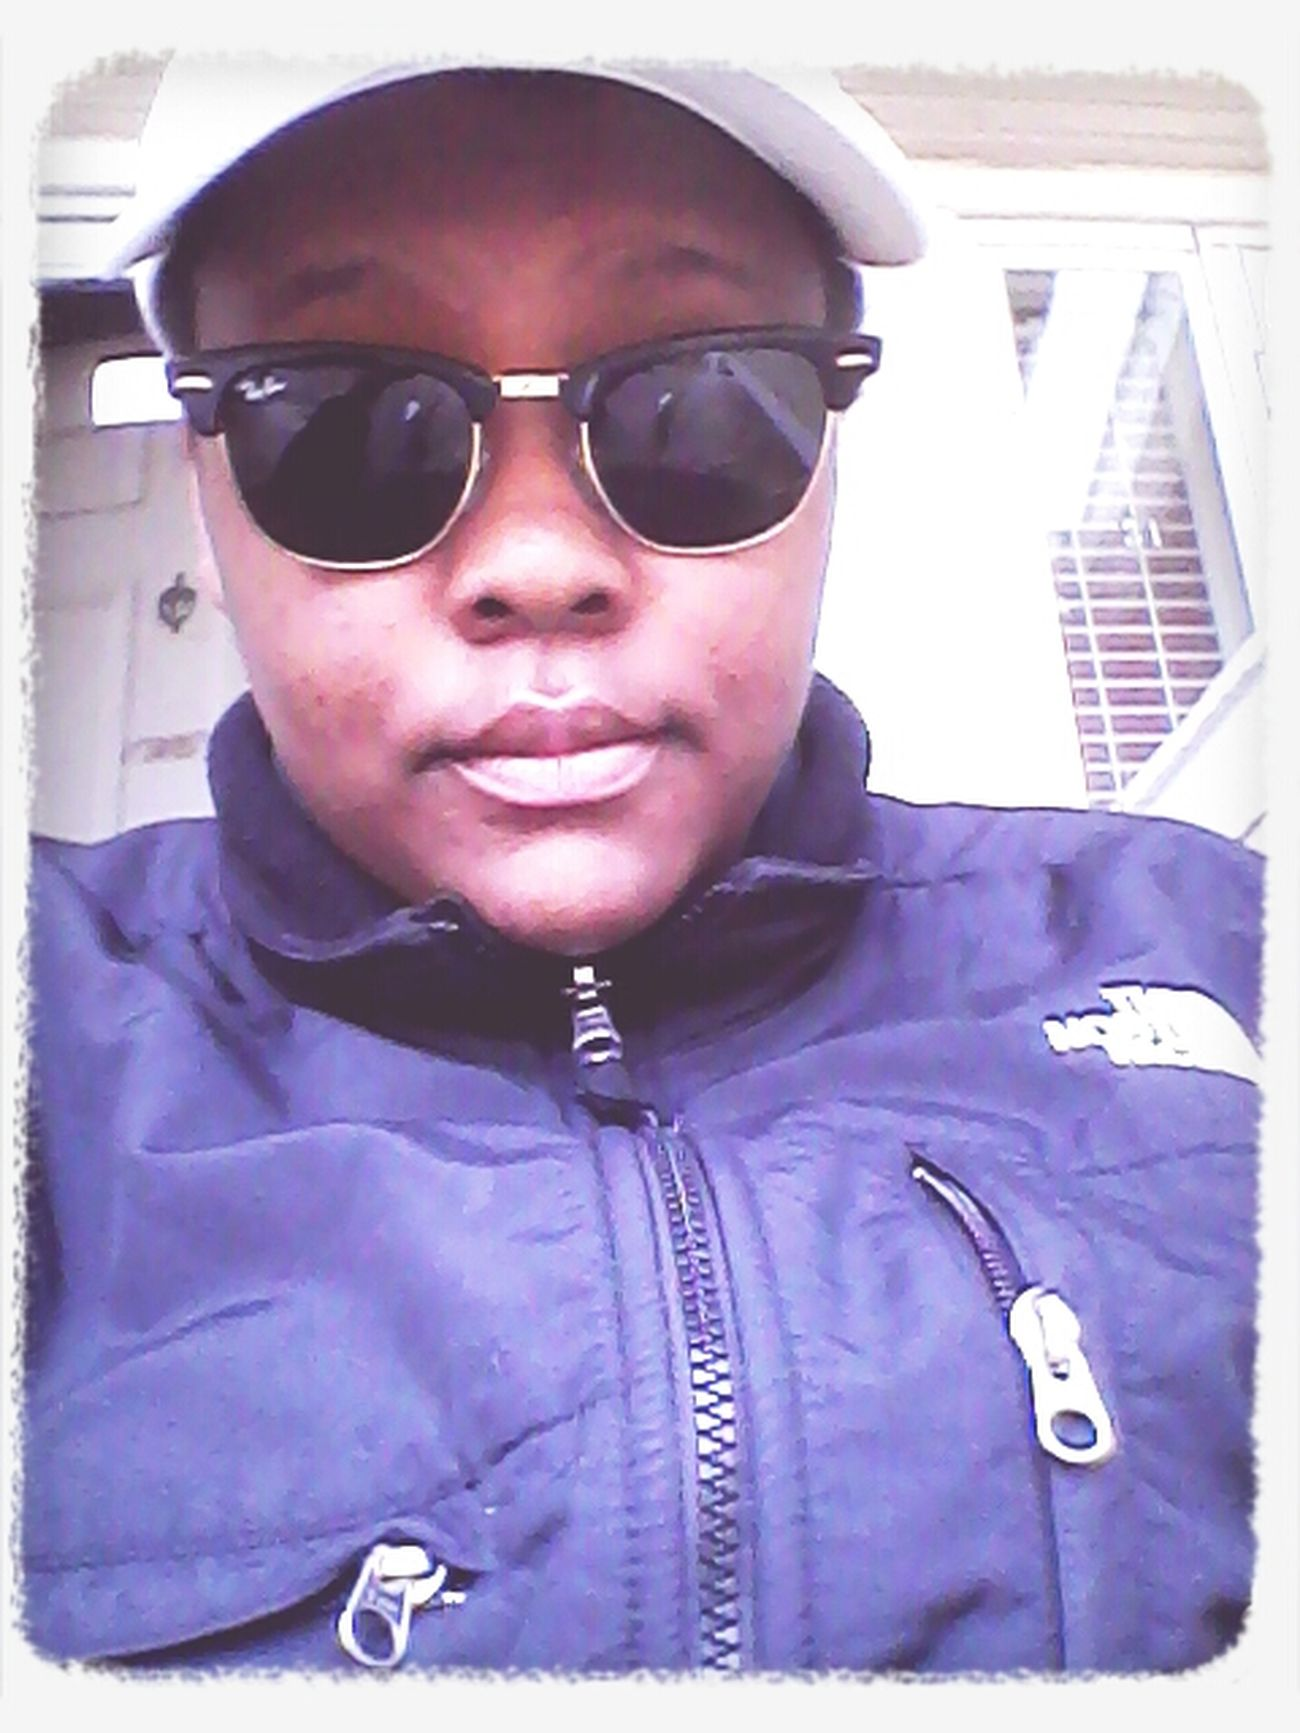 #Windy Day